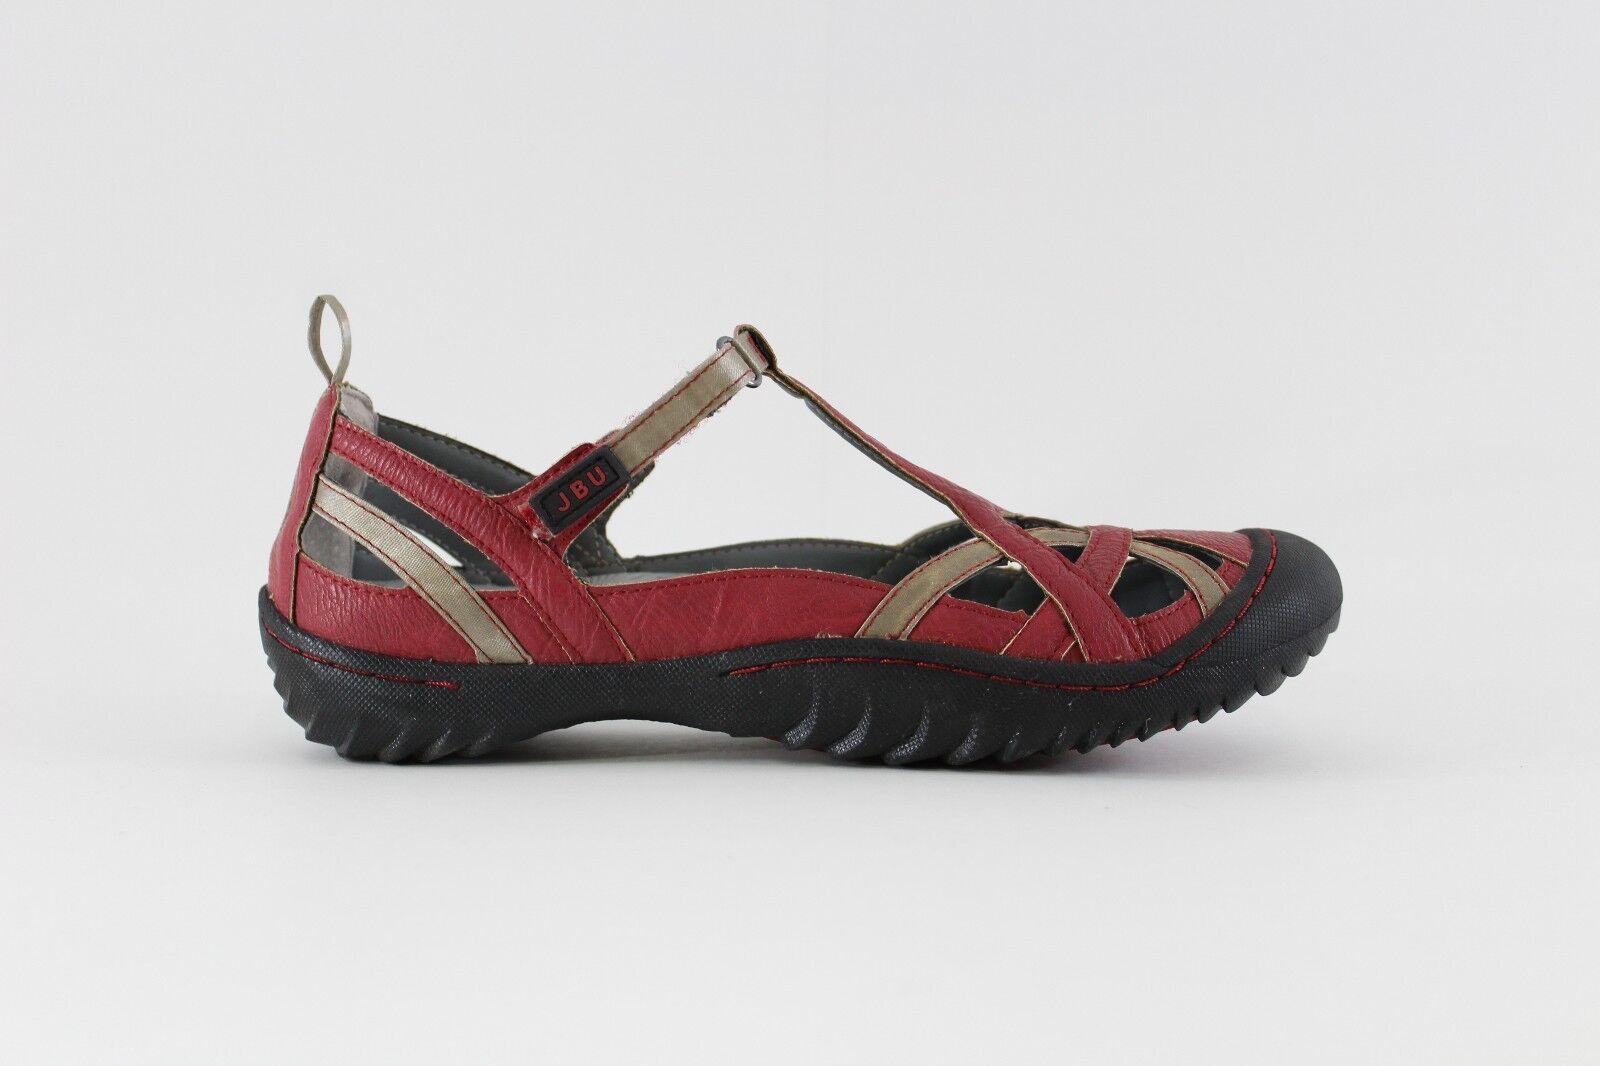 UNIONBAY Sandal,Gold,7.5 Donna Ice Candy Sandal,Gold,7.5 UNIONBAY M ebe218